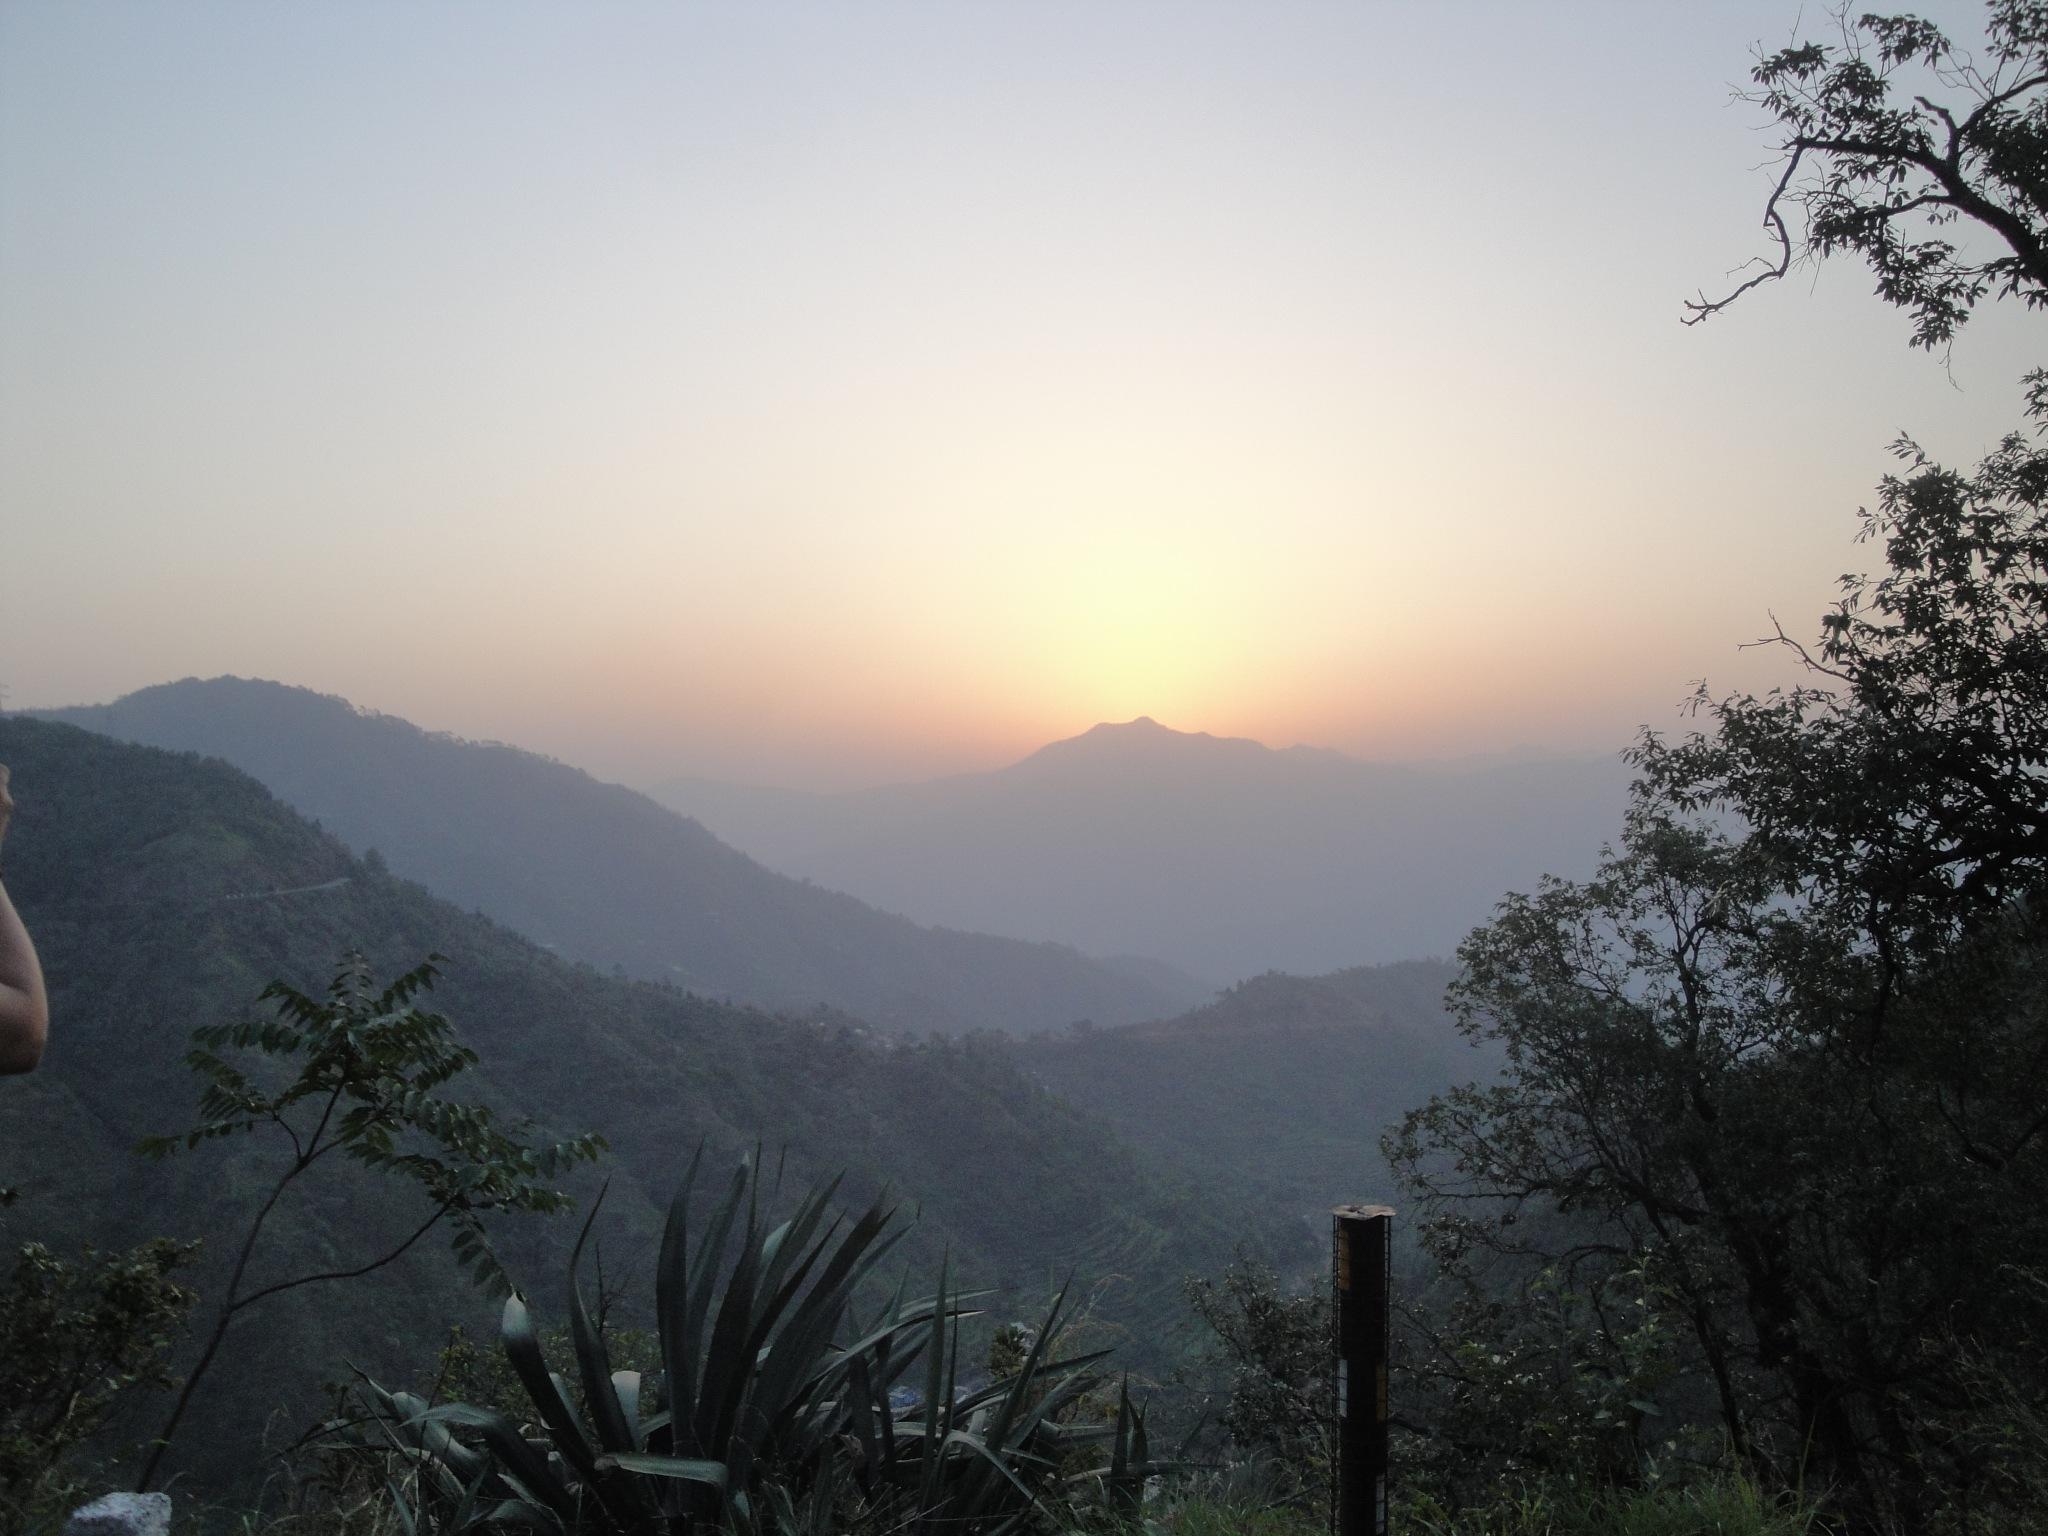 Sunrise on the Himalayan by prashh14